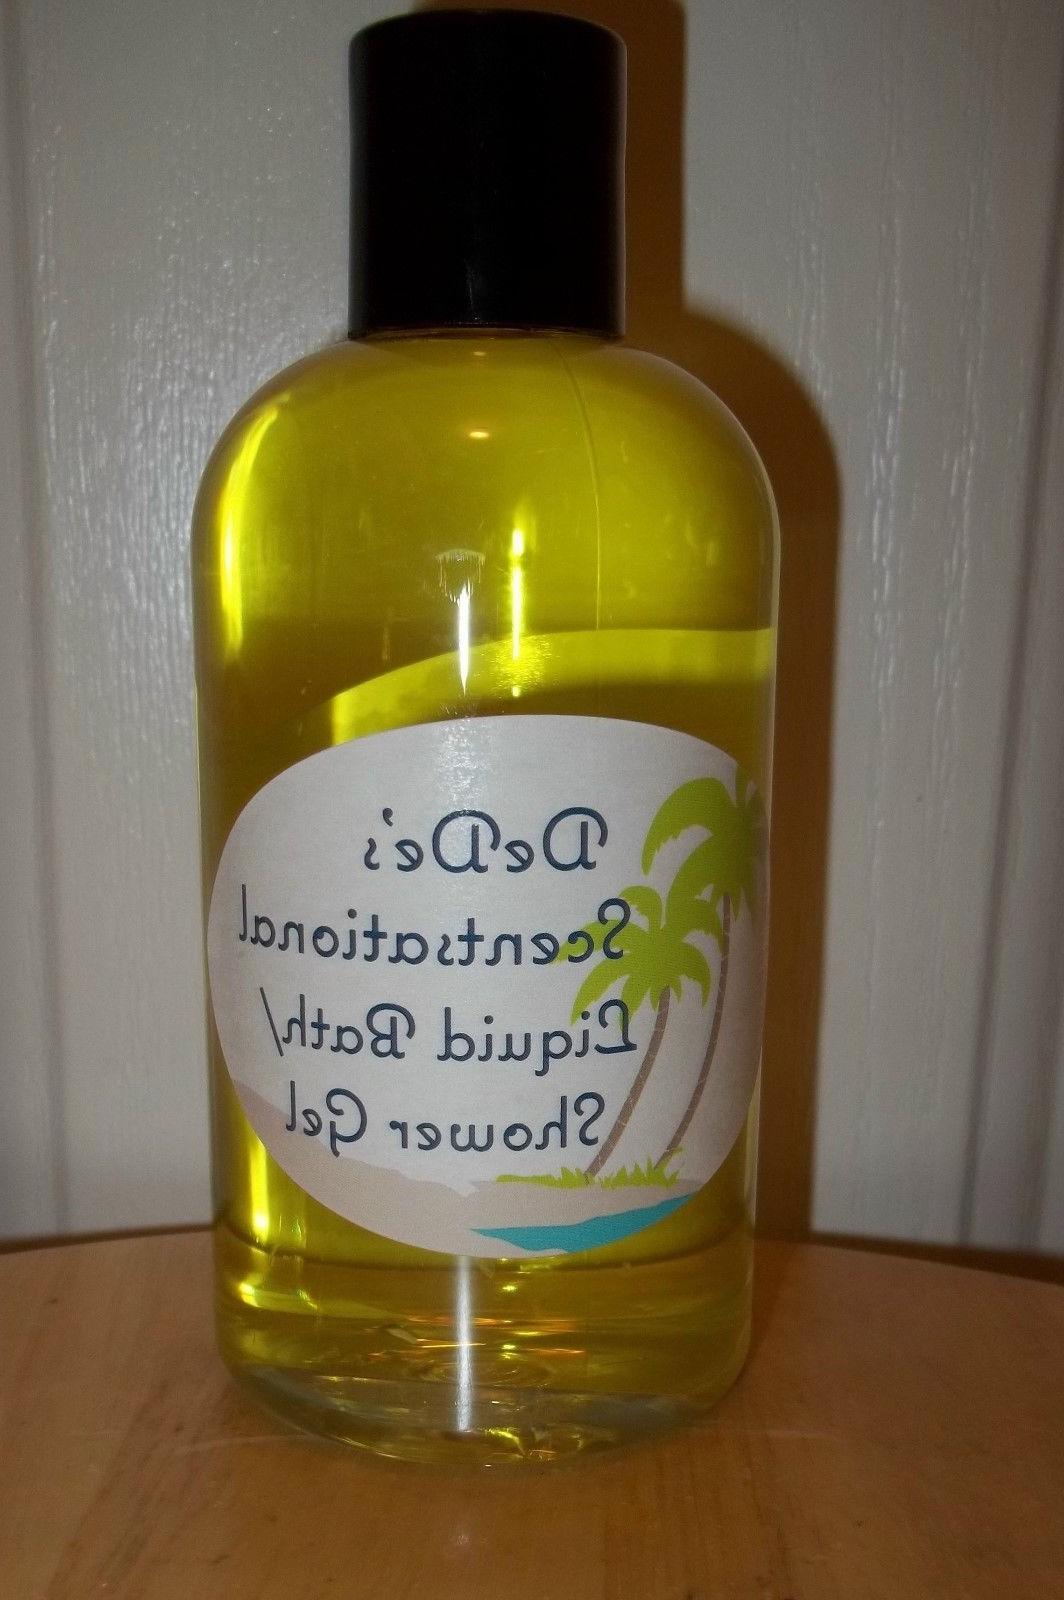 16 oz Handmade Body Wash